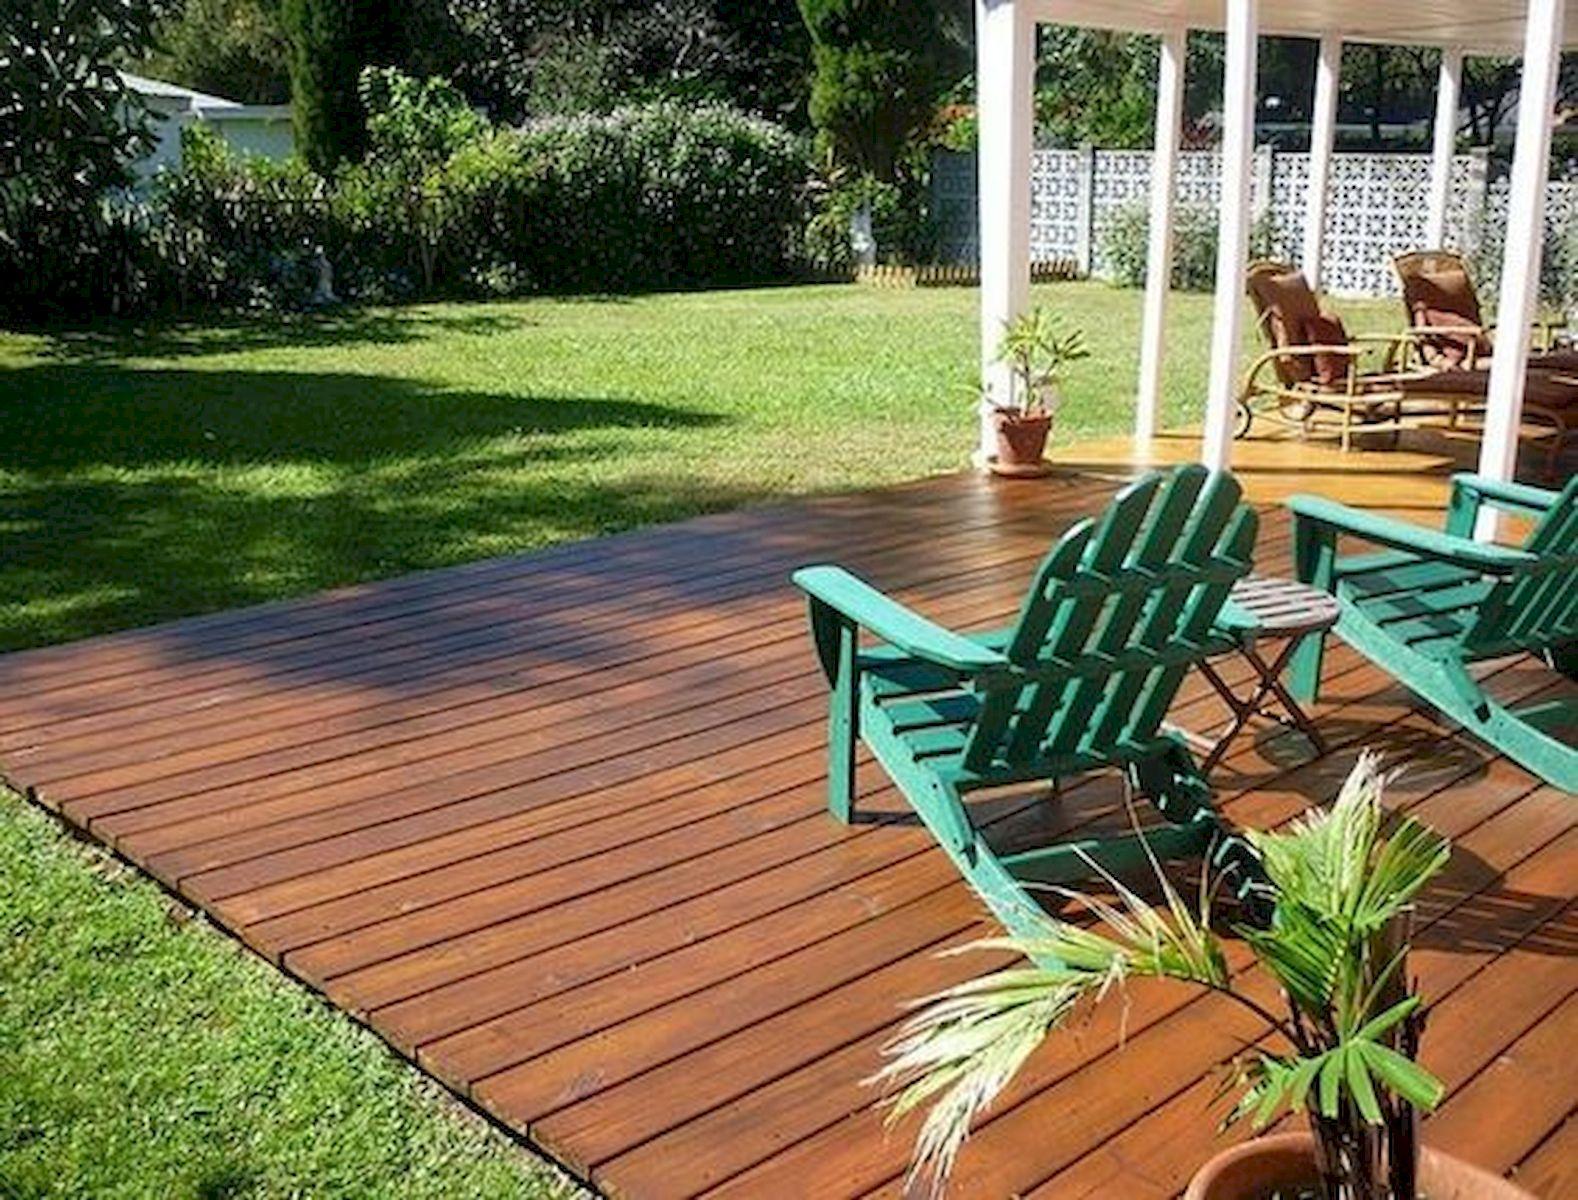 50 Fantastic Backyard Patio and Decking Design Ideas (47)